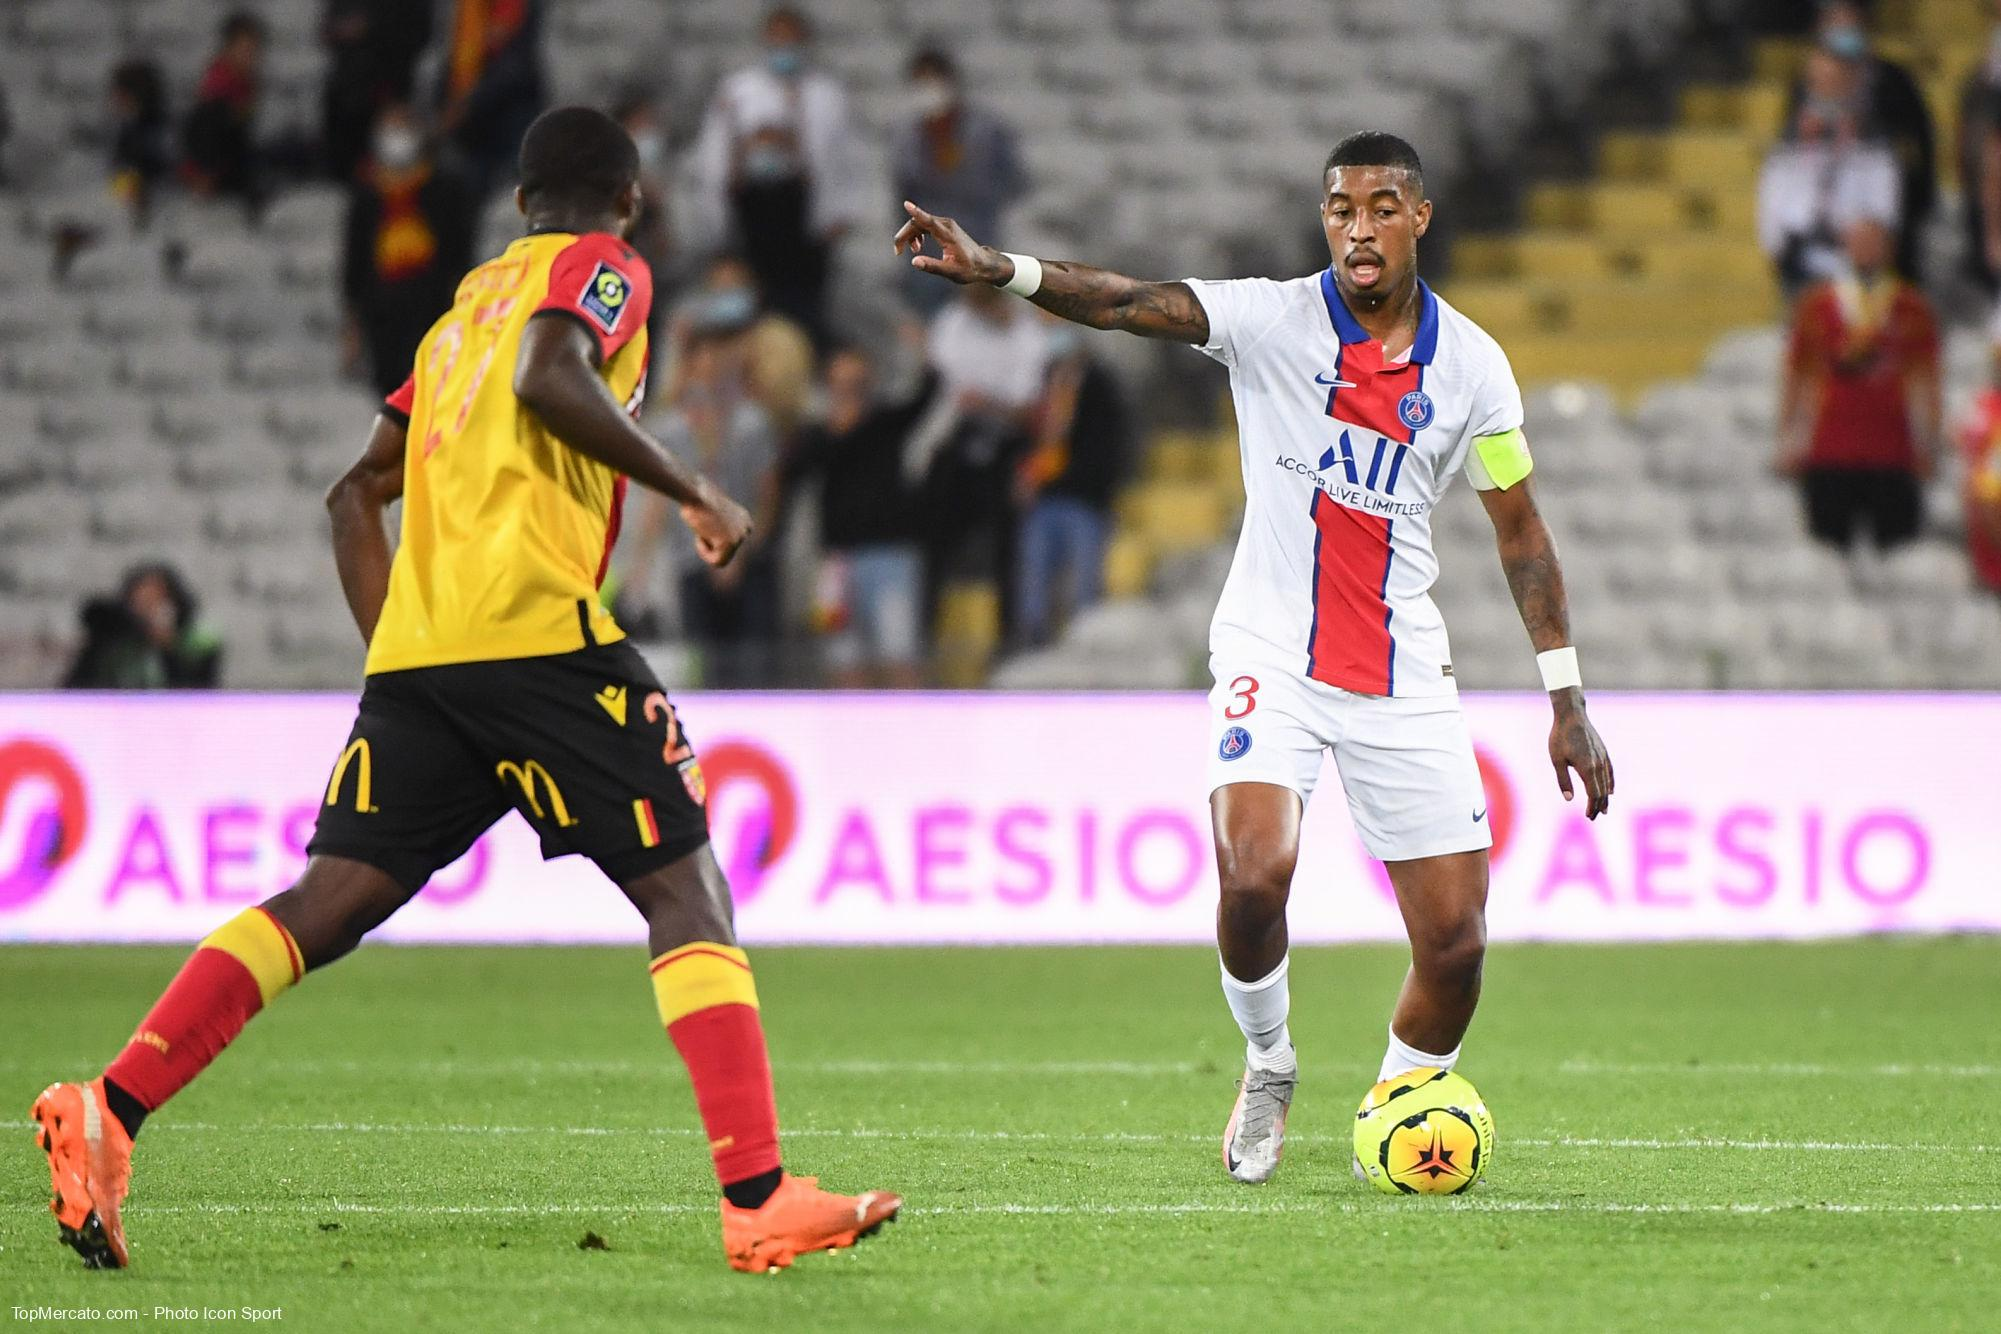 Presnel Kimpembe, RC Lens - Paris Saint-Germain